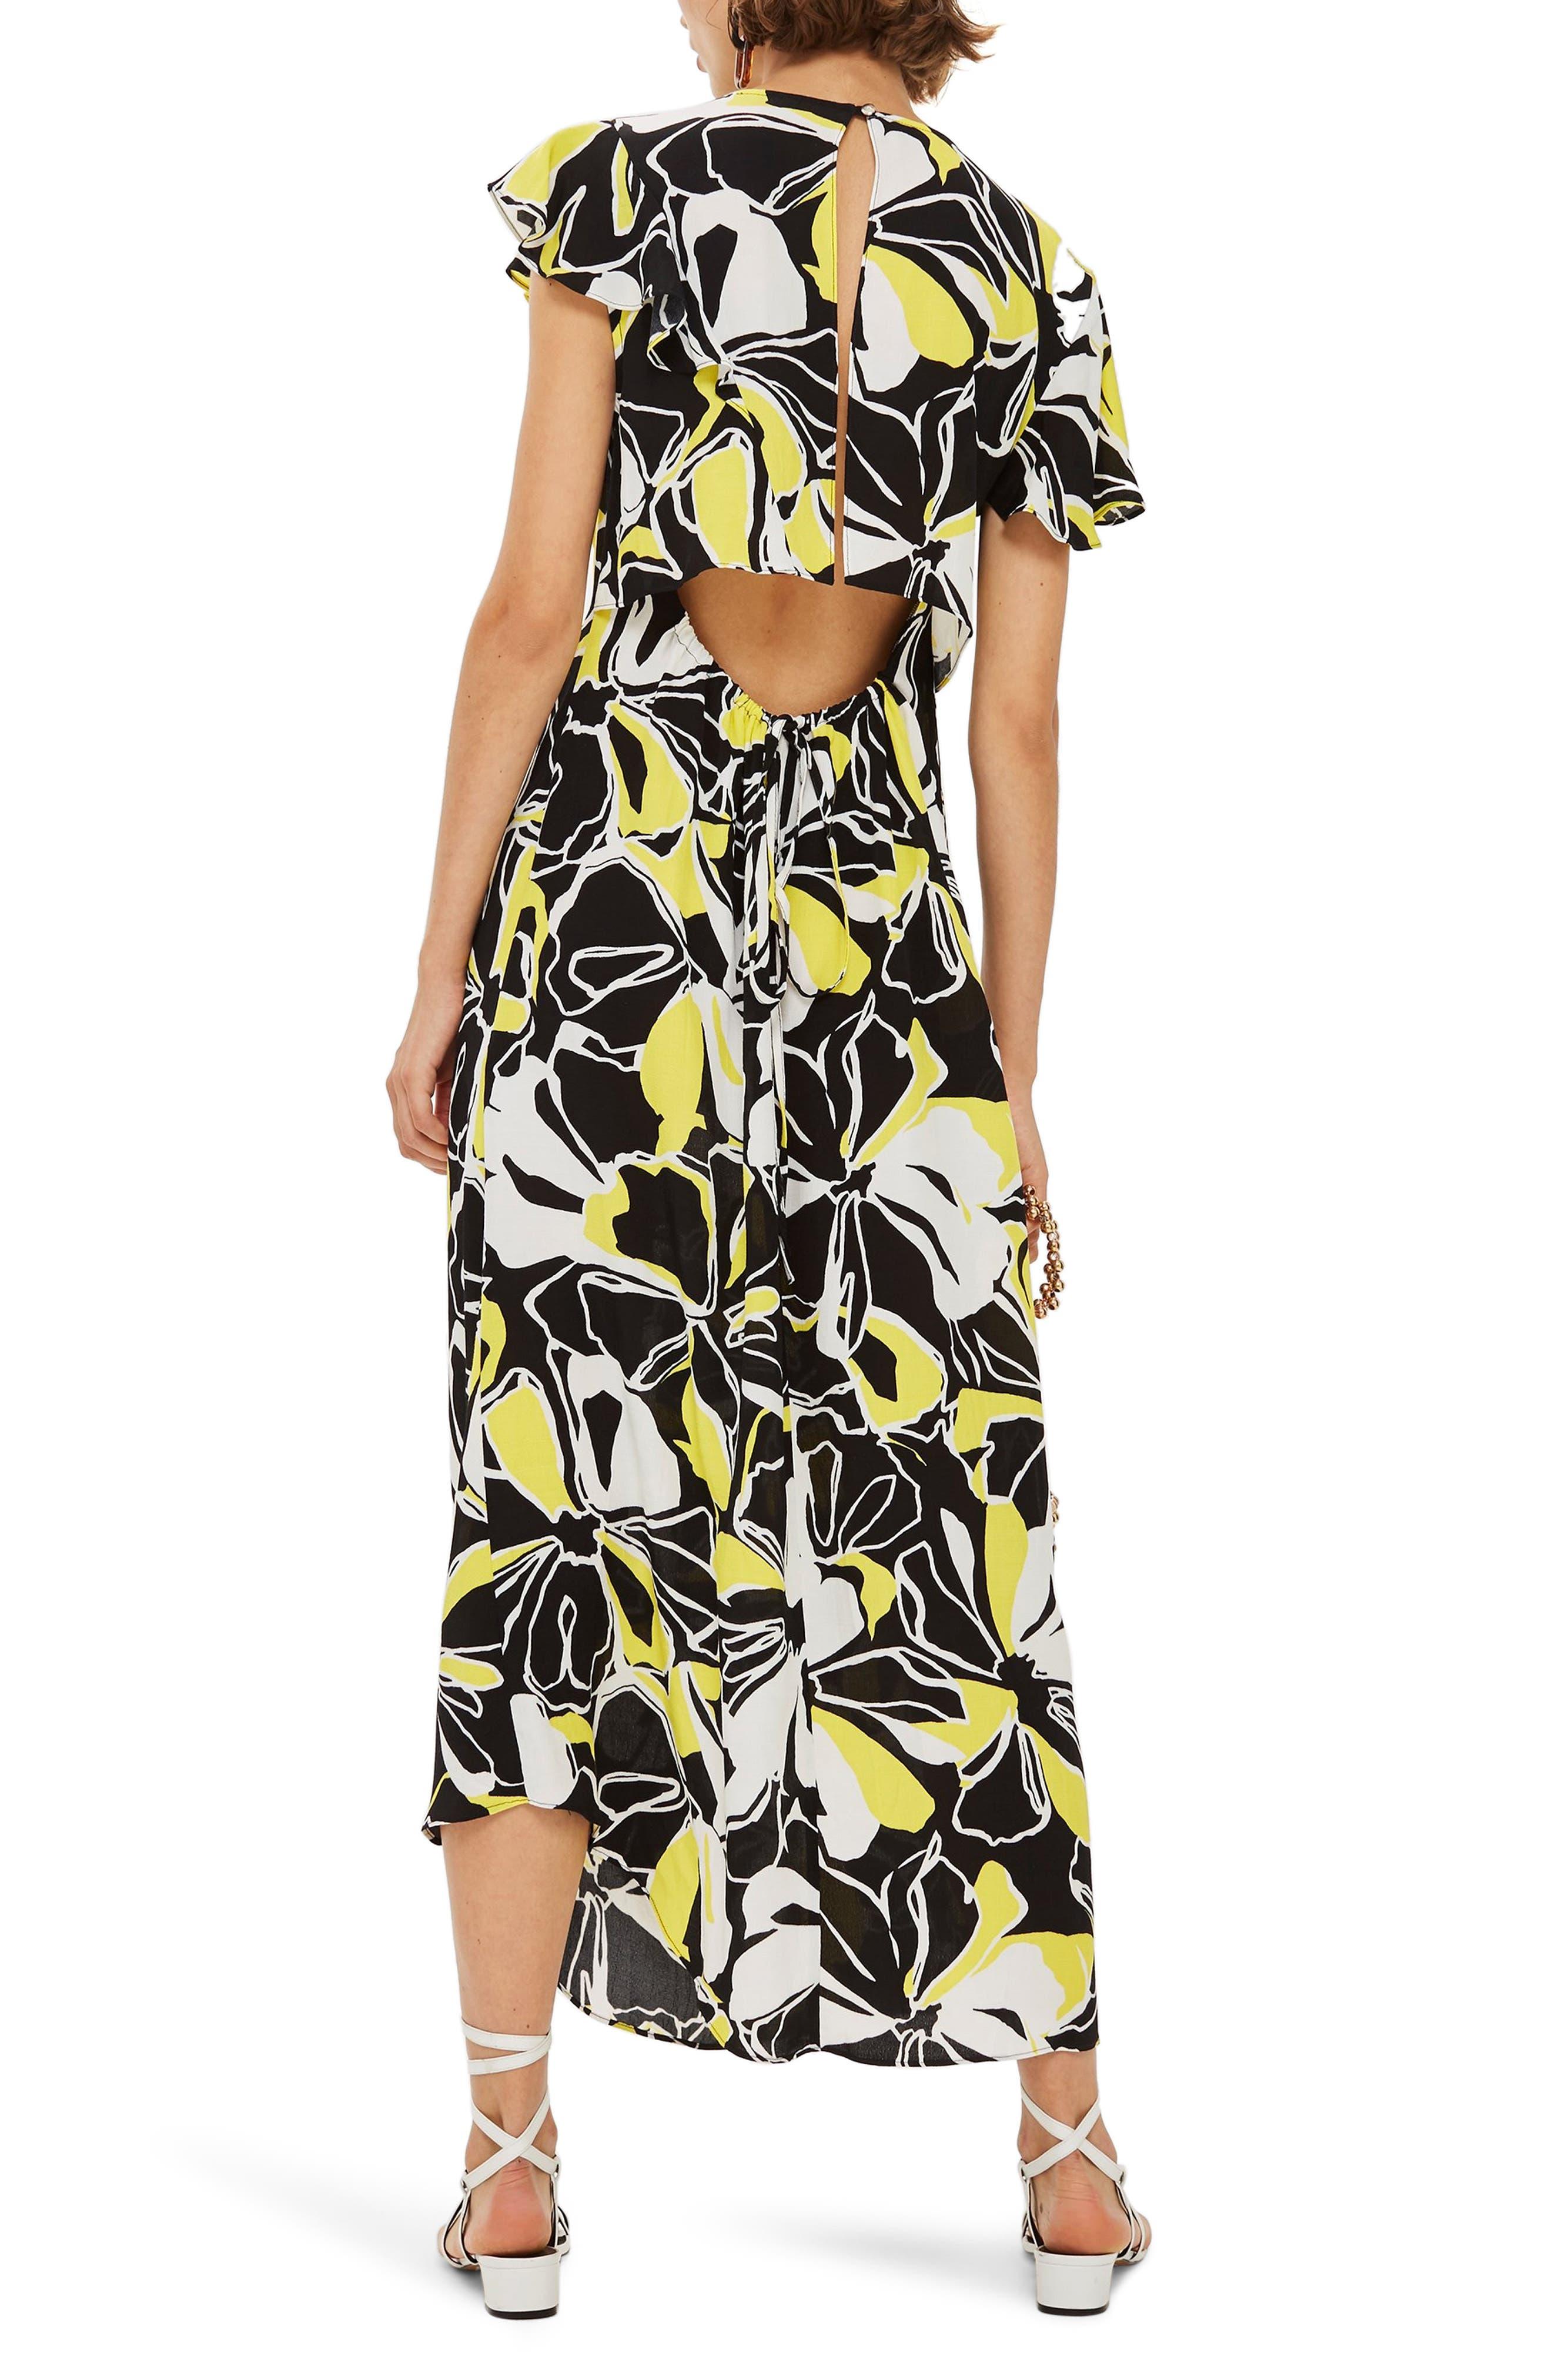 Deconstructed Floral Print Maxi Dress,                             Alternate thumbnail 2, color,                             BLACK MULTI